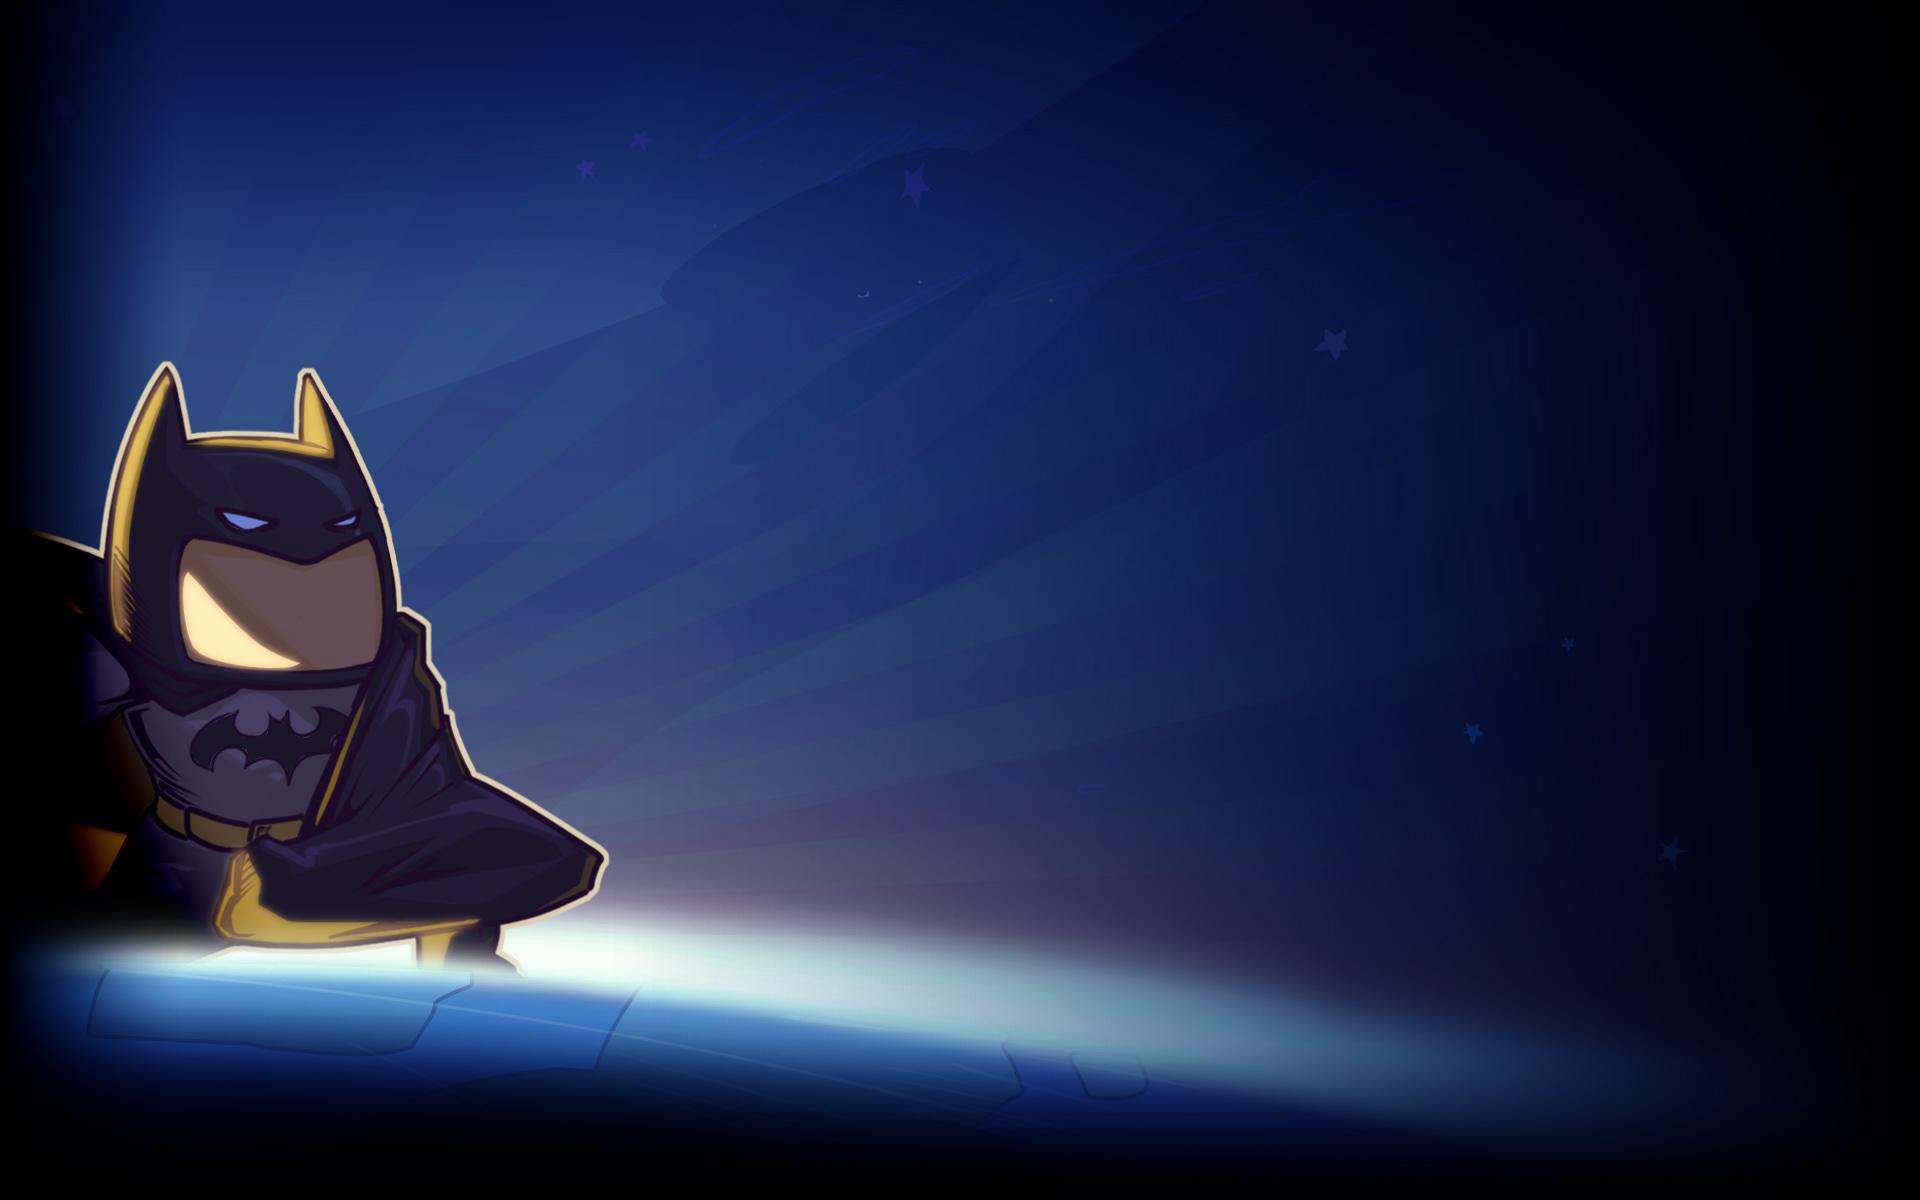 Screenshot Wallpaper Gravity Falls Steam Community Guide How To Make A Cool Steam Profile